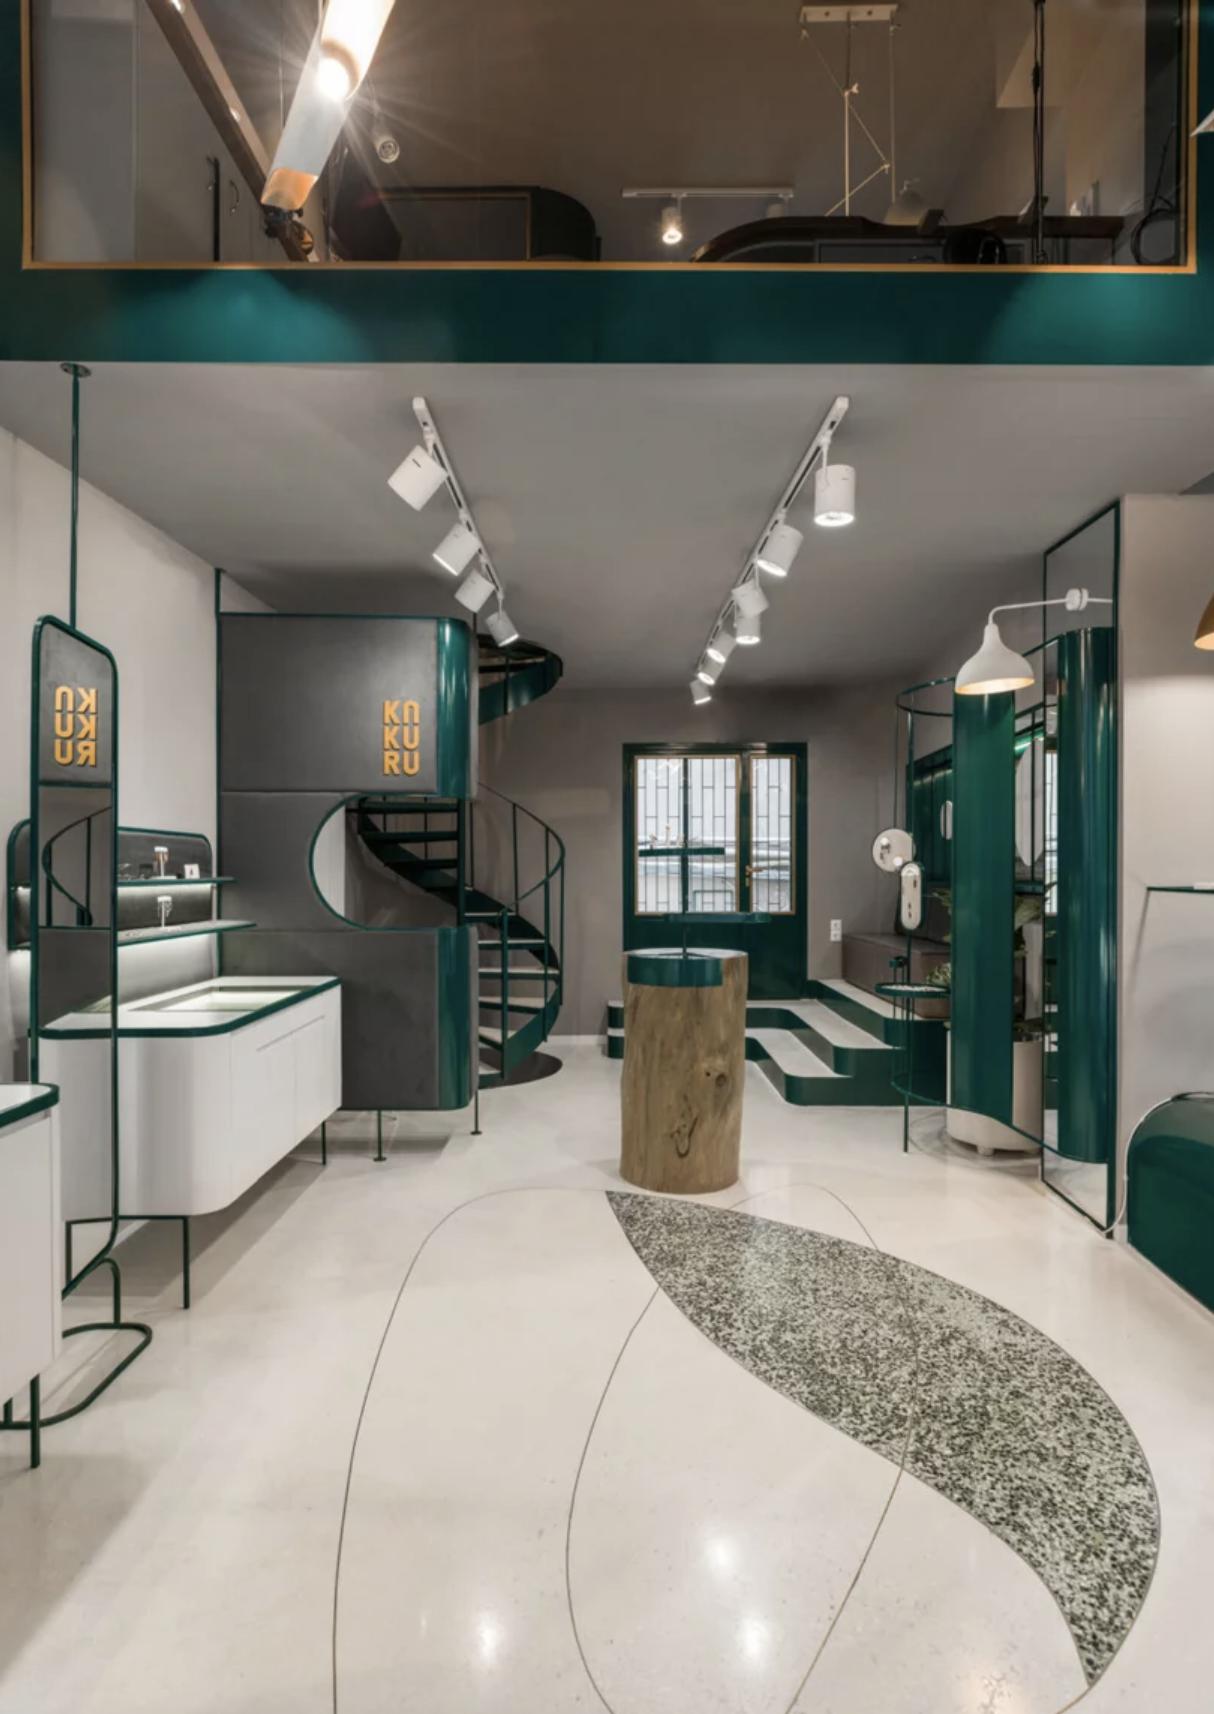 viventium-design-zac-kraemer-urban-soul-jewelry-retail-design-10.png